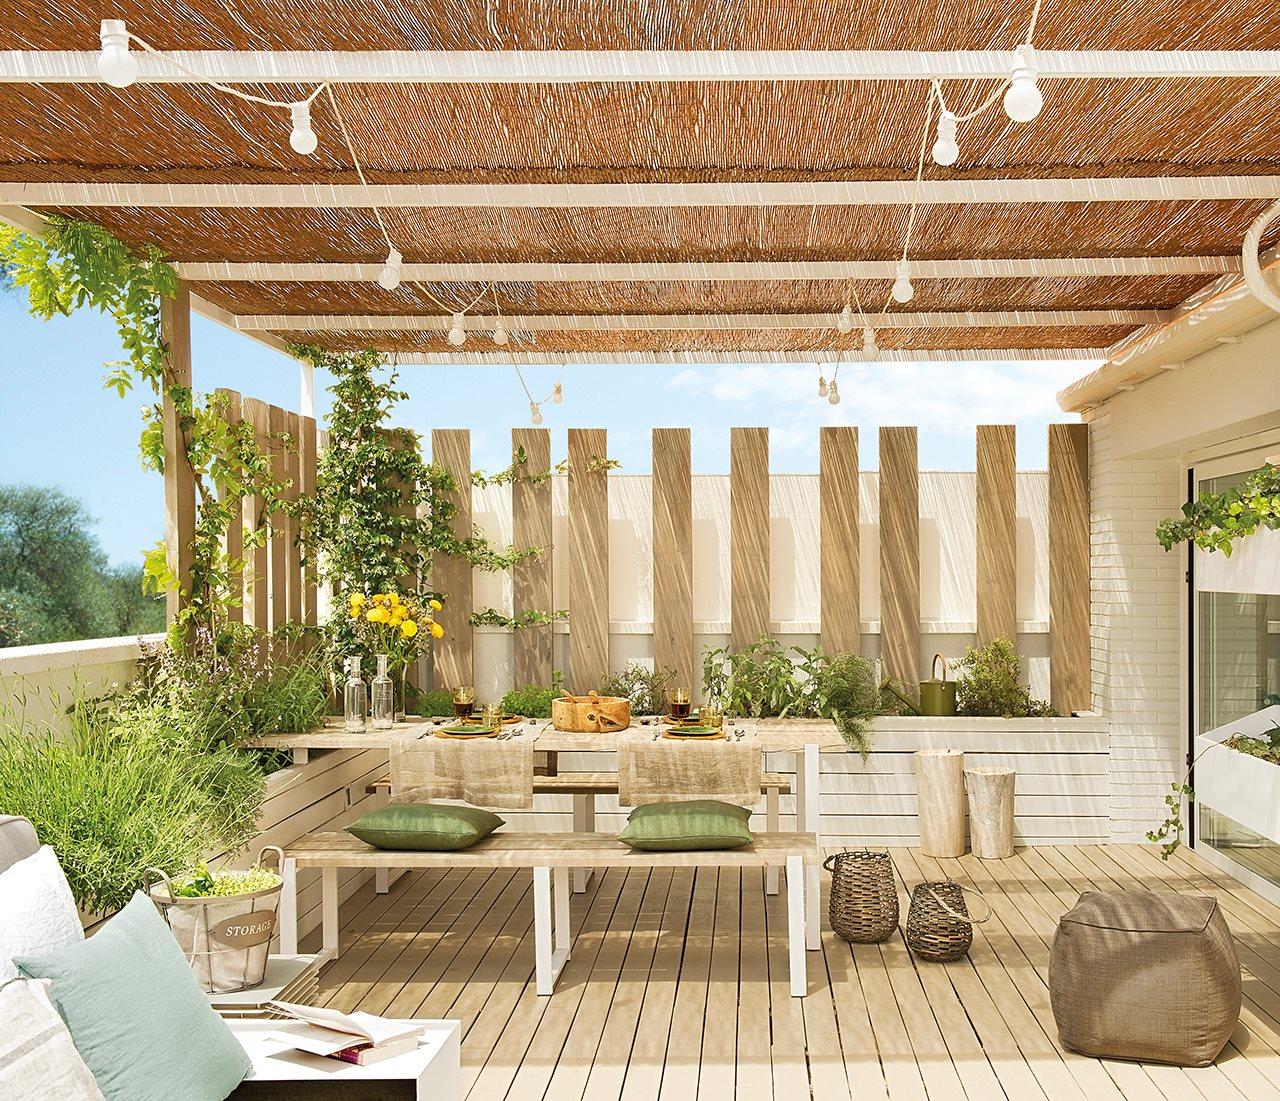 Un oasis en plena ciudad for Arredo balconi e terrazze